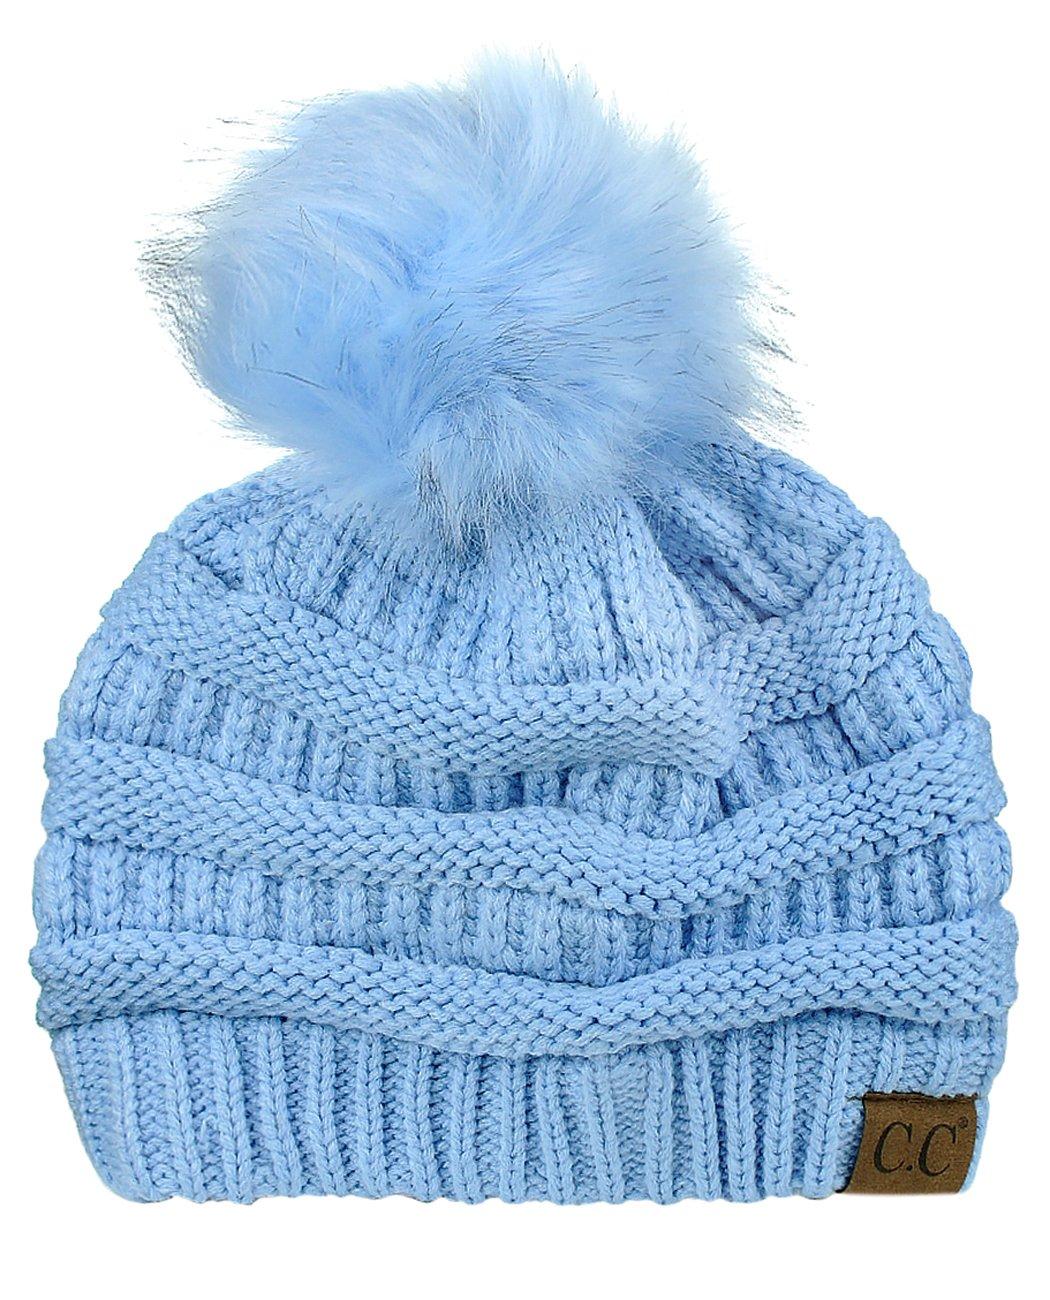 d837714c1ee Galleon - NYFASHION101 Exclusive Soft Stretch Cable Knit Faux Fur Pom Pom  Beanie Hat - Pale Blue Pom